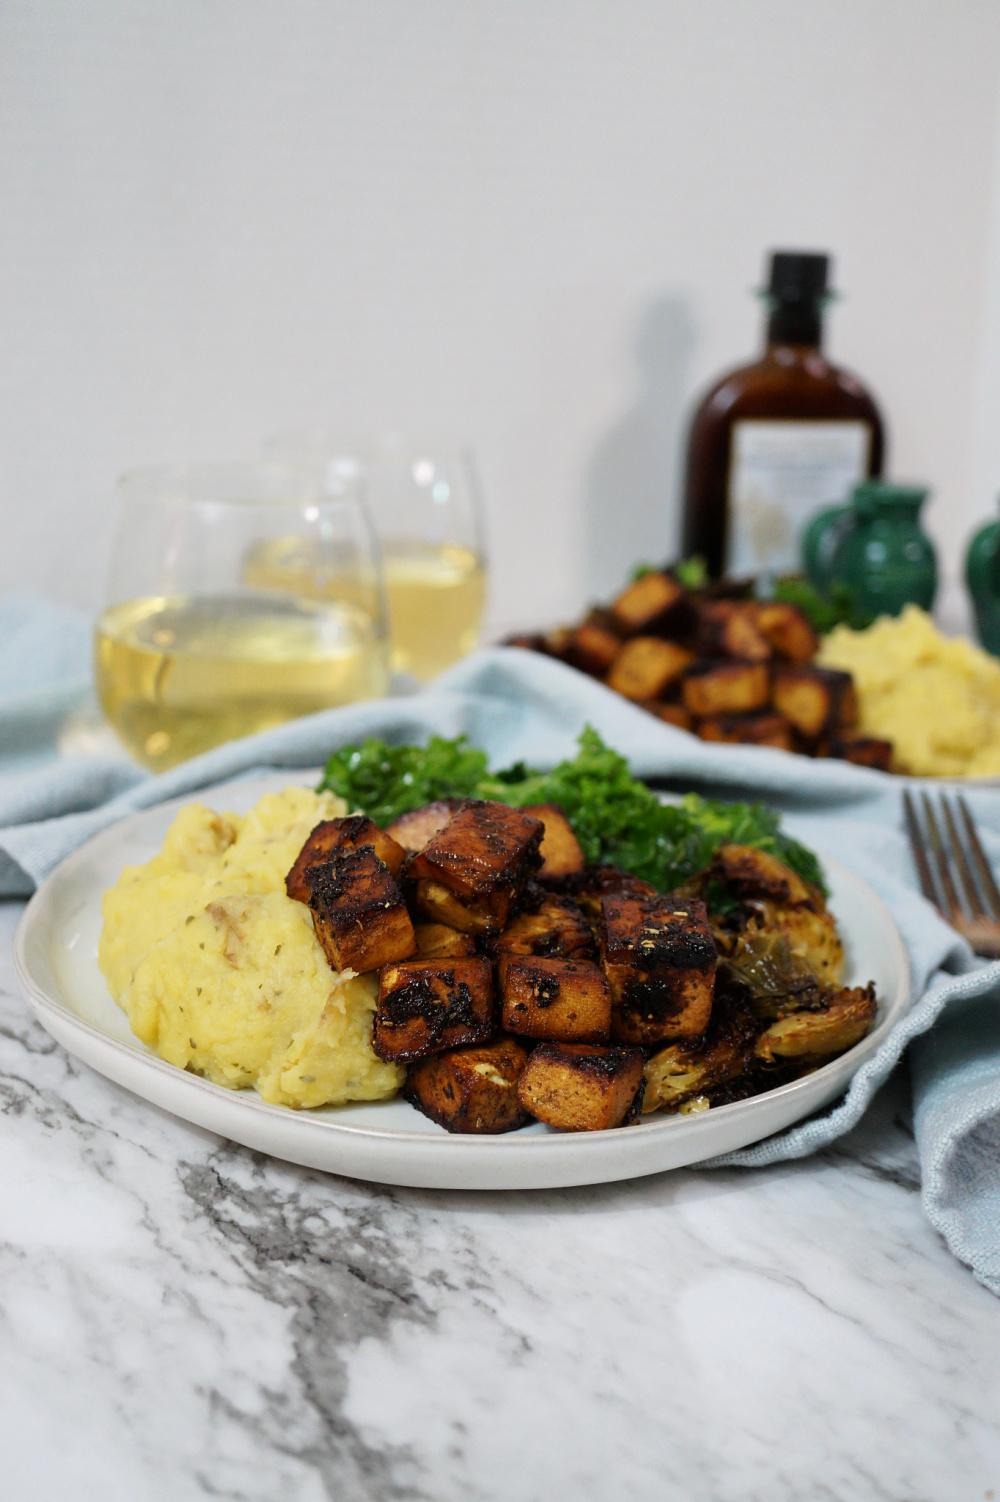 plate of balsamic tofu with mashed potatoes and veggies